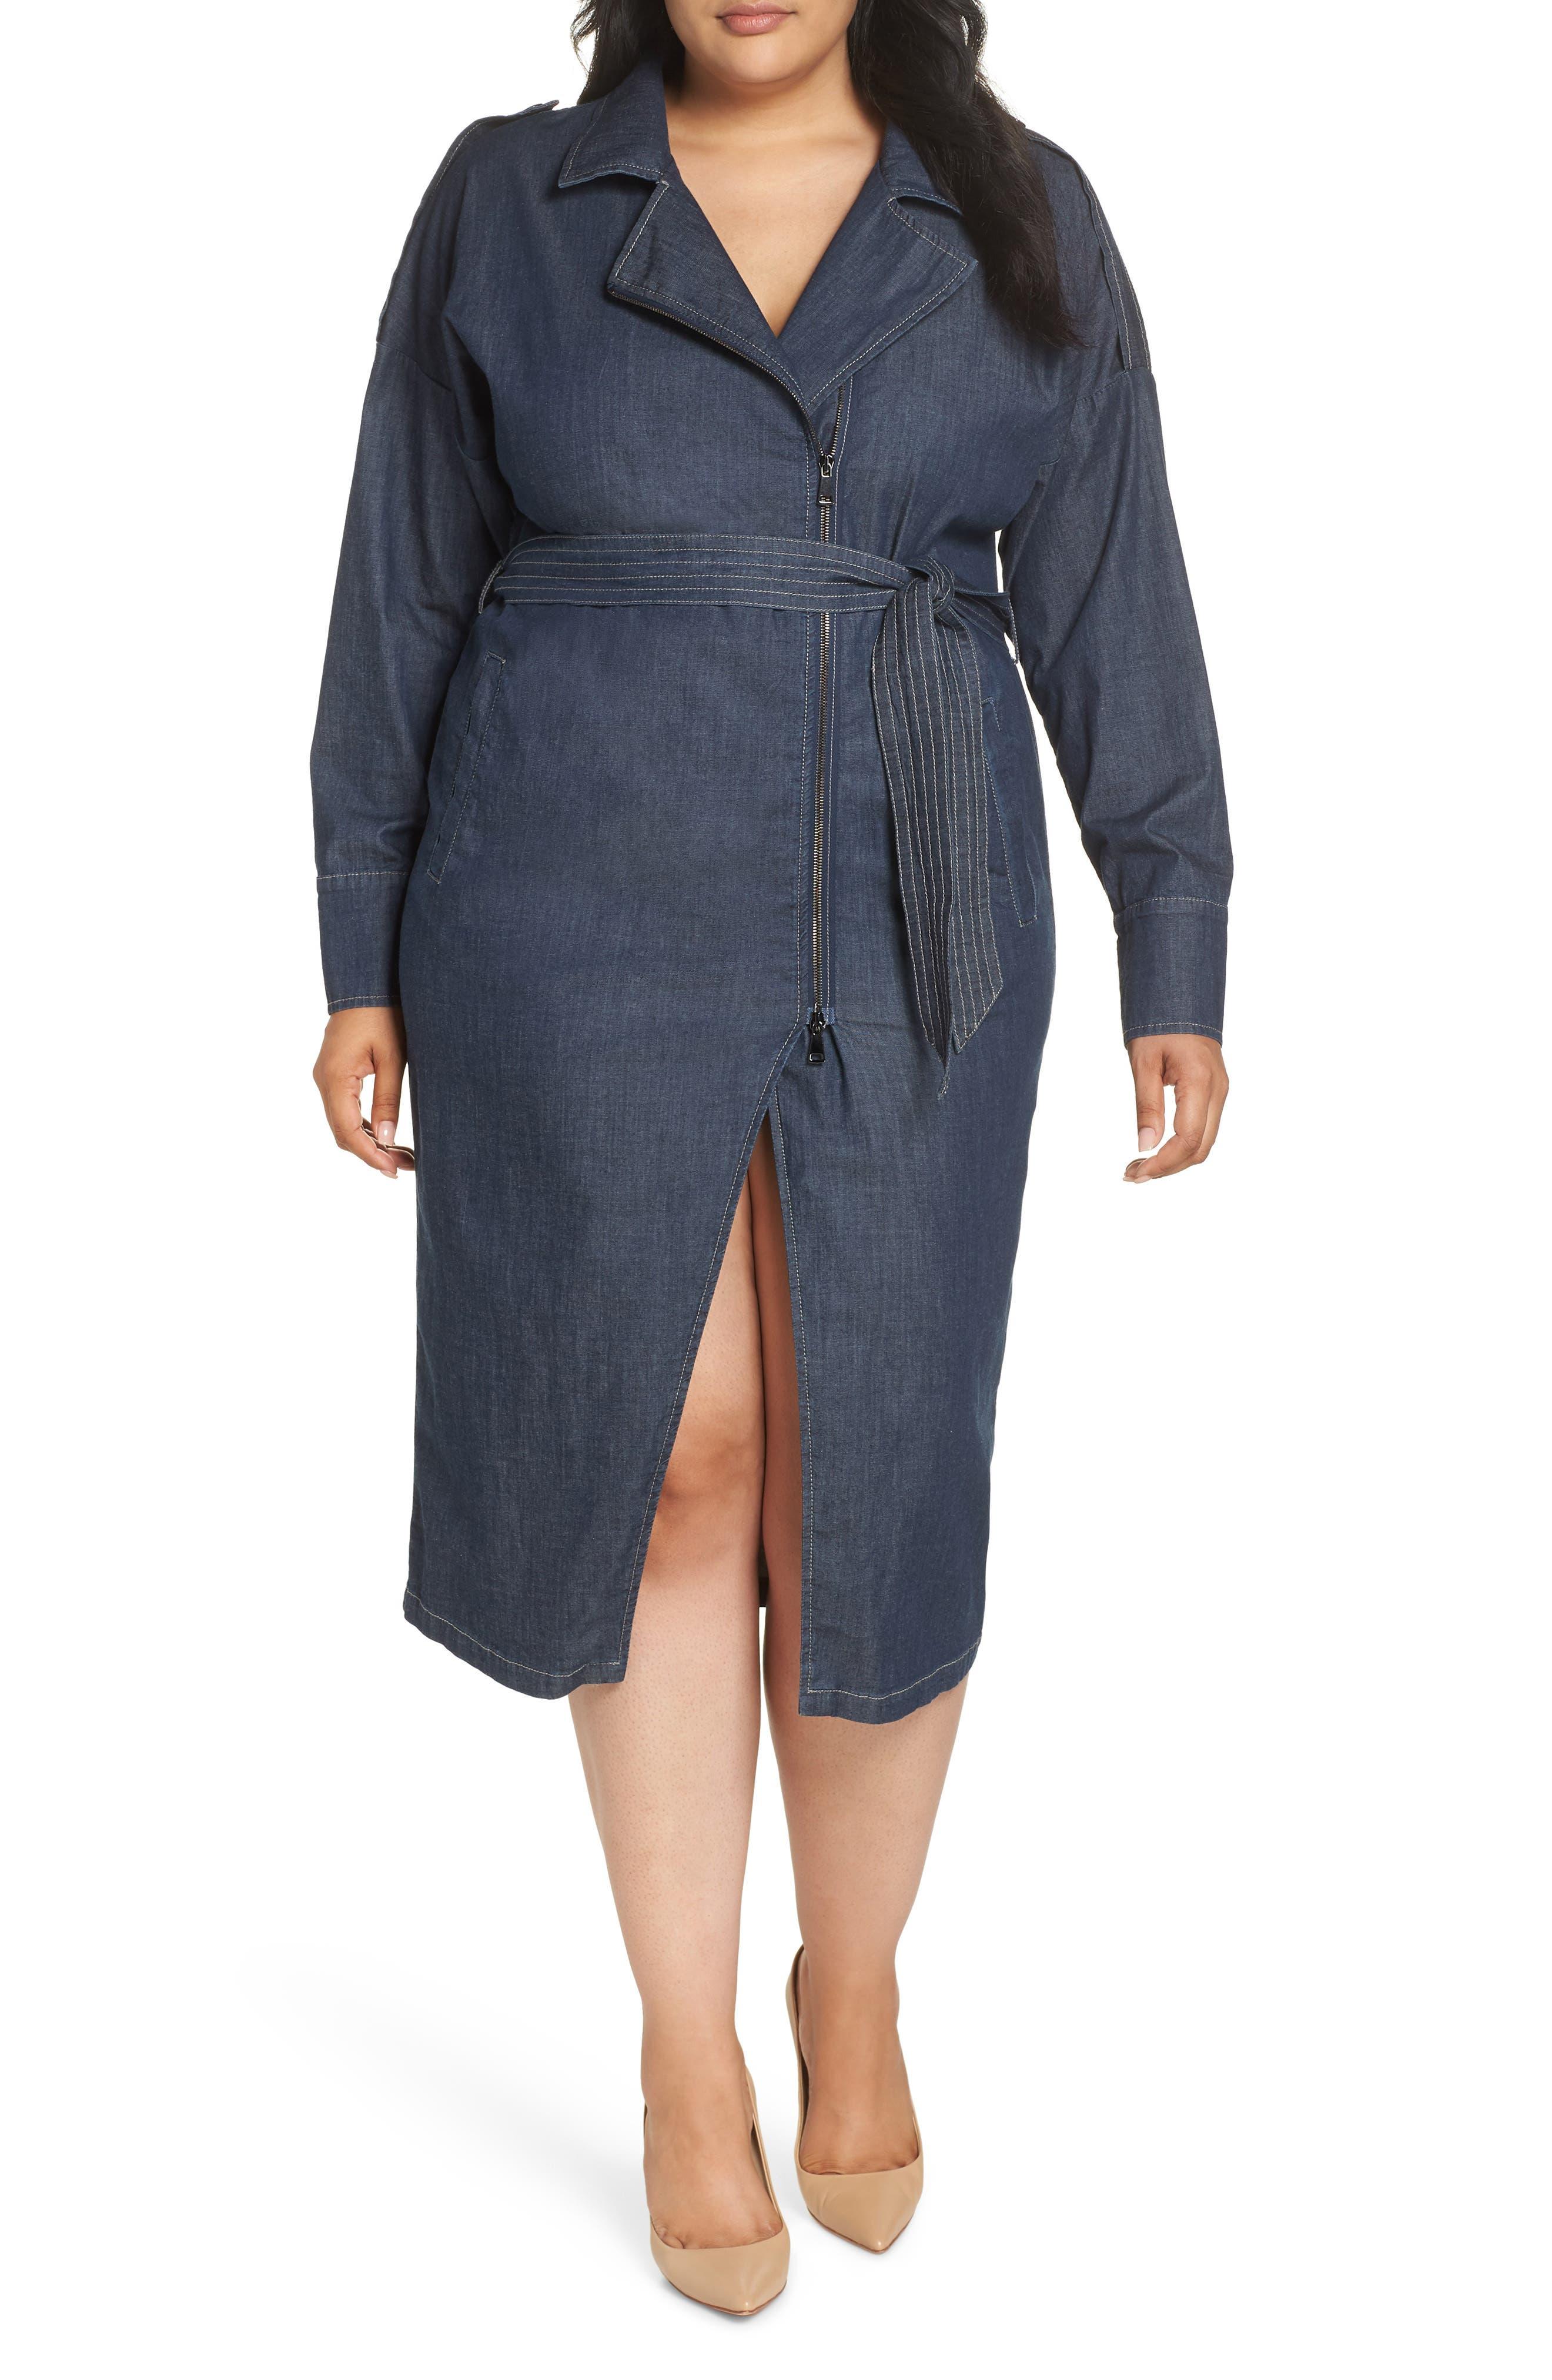 plus size women's ashley graham x marina rinaldi decuria denim shirtdress